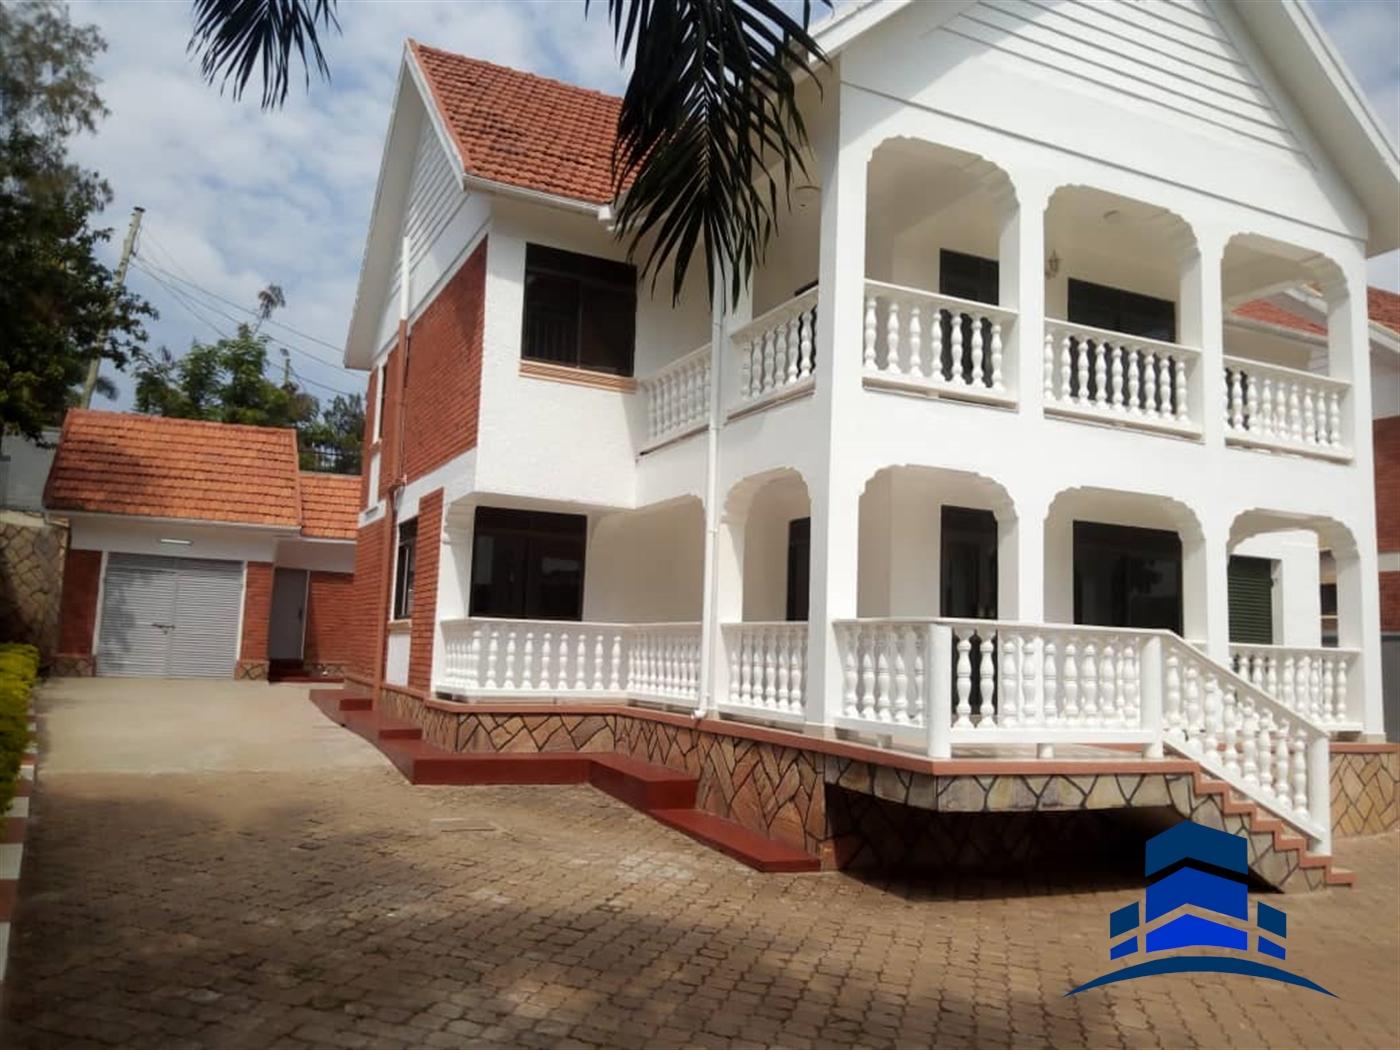 Mansion for sale in Naguru Kampala